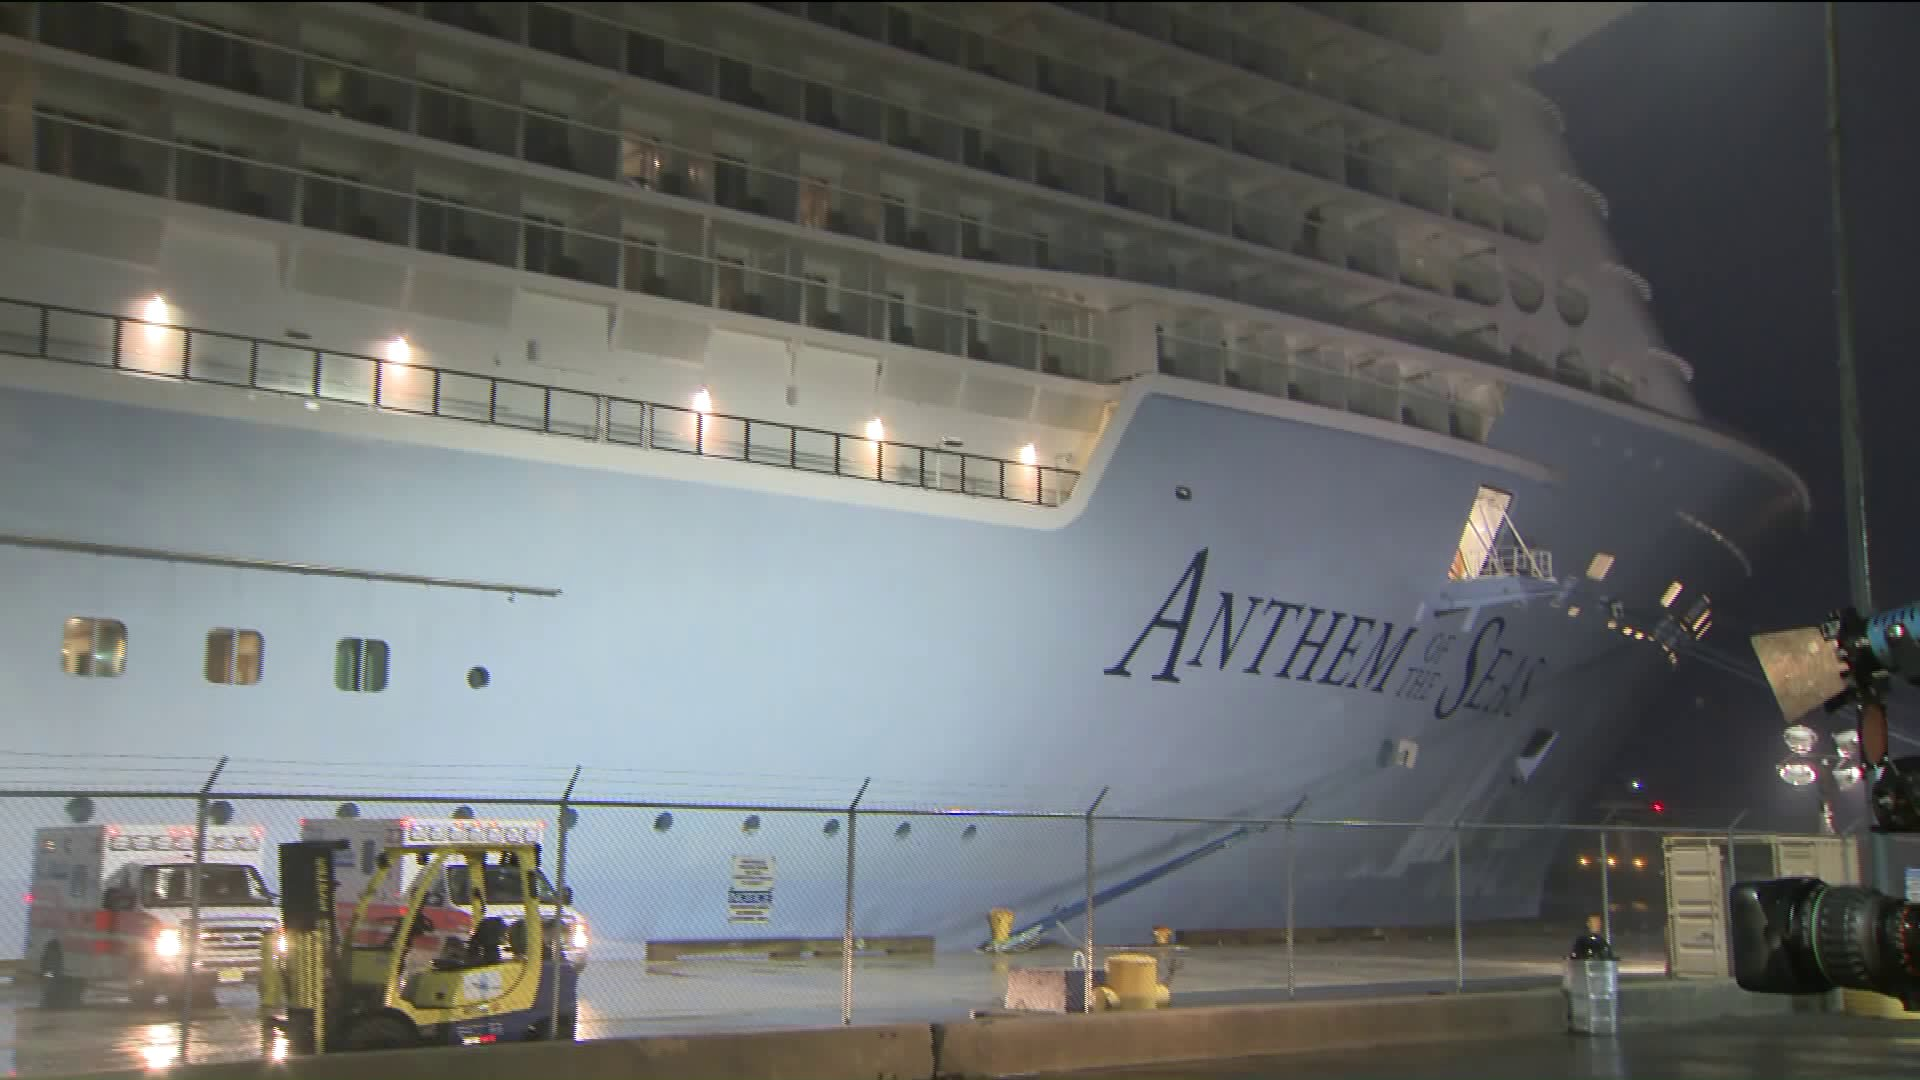 Royal Caribbean cruise ship docks in Bayonne, New Jersey amid coronavirus fears